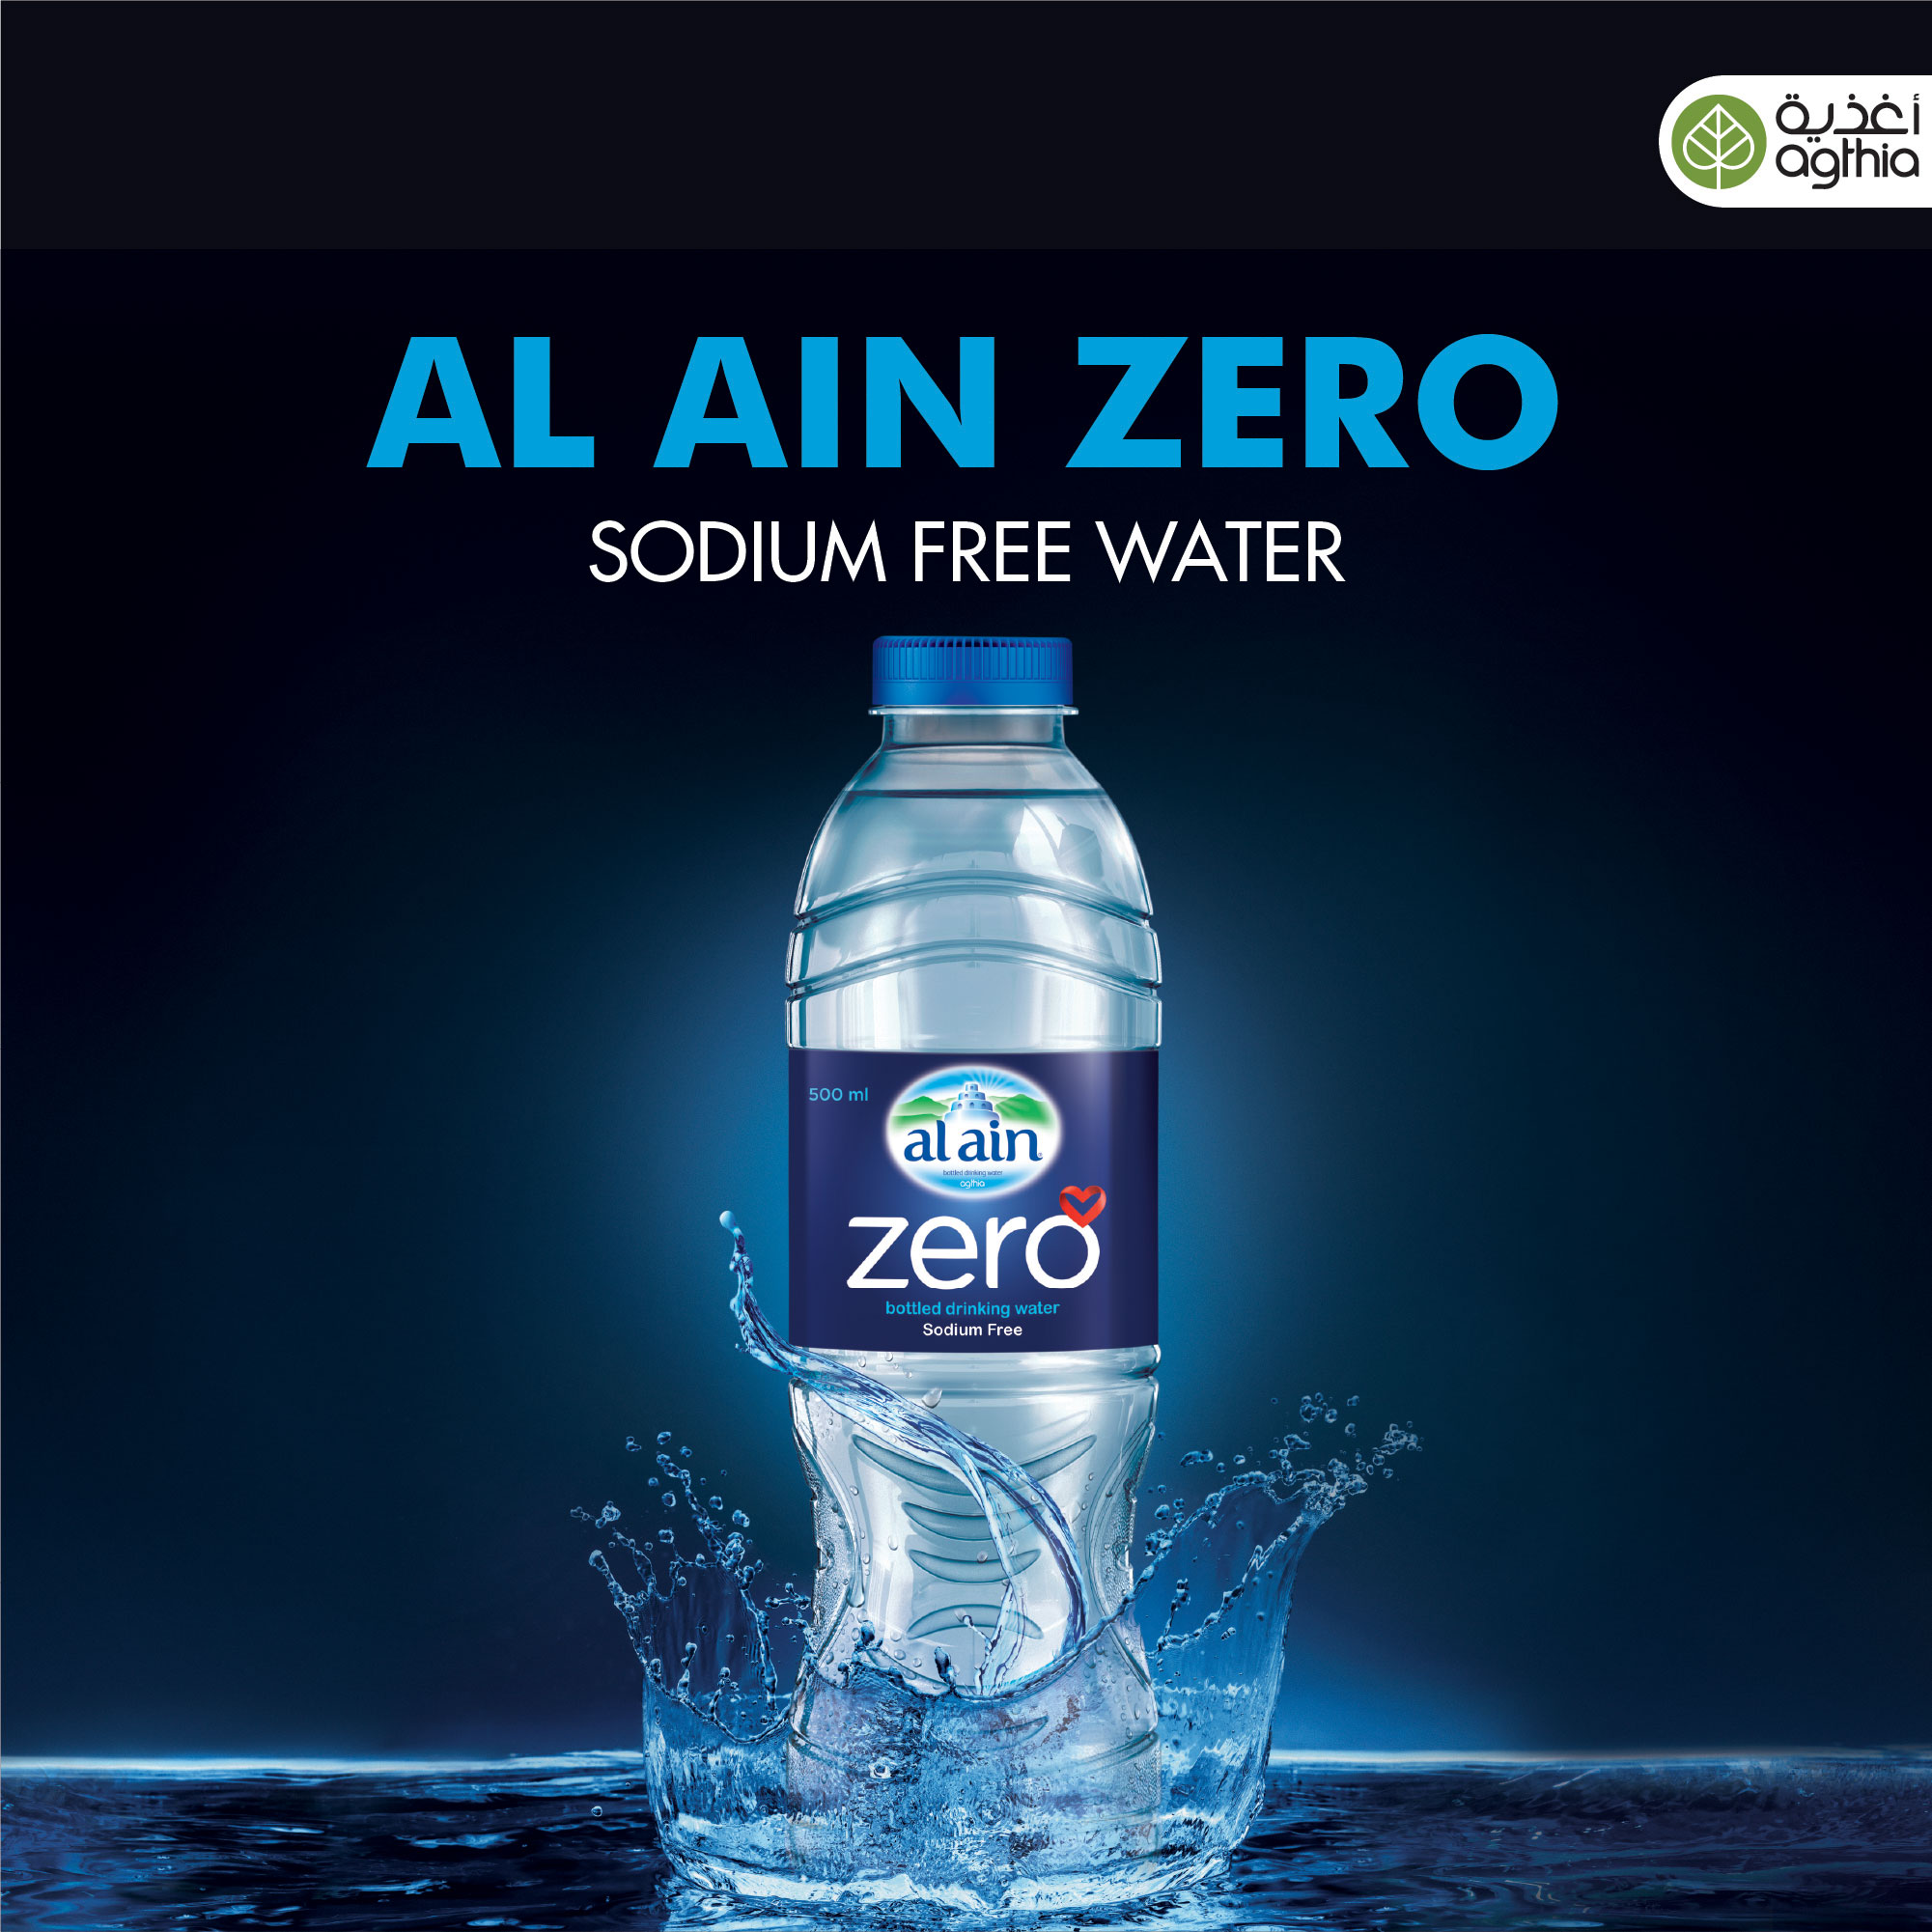 Al Ain Zero